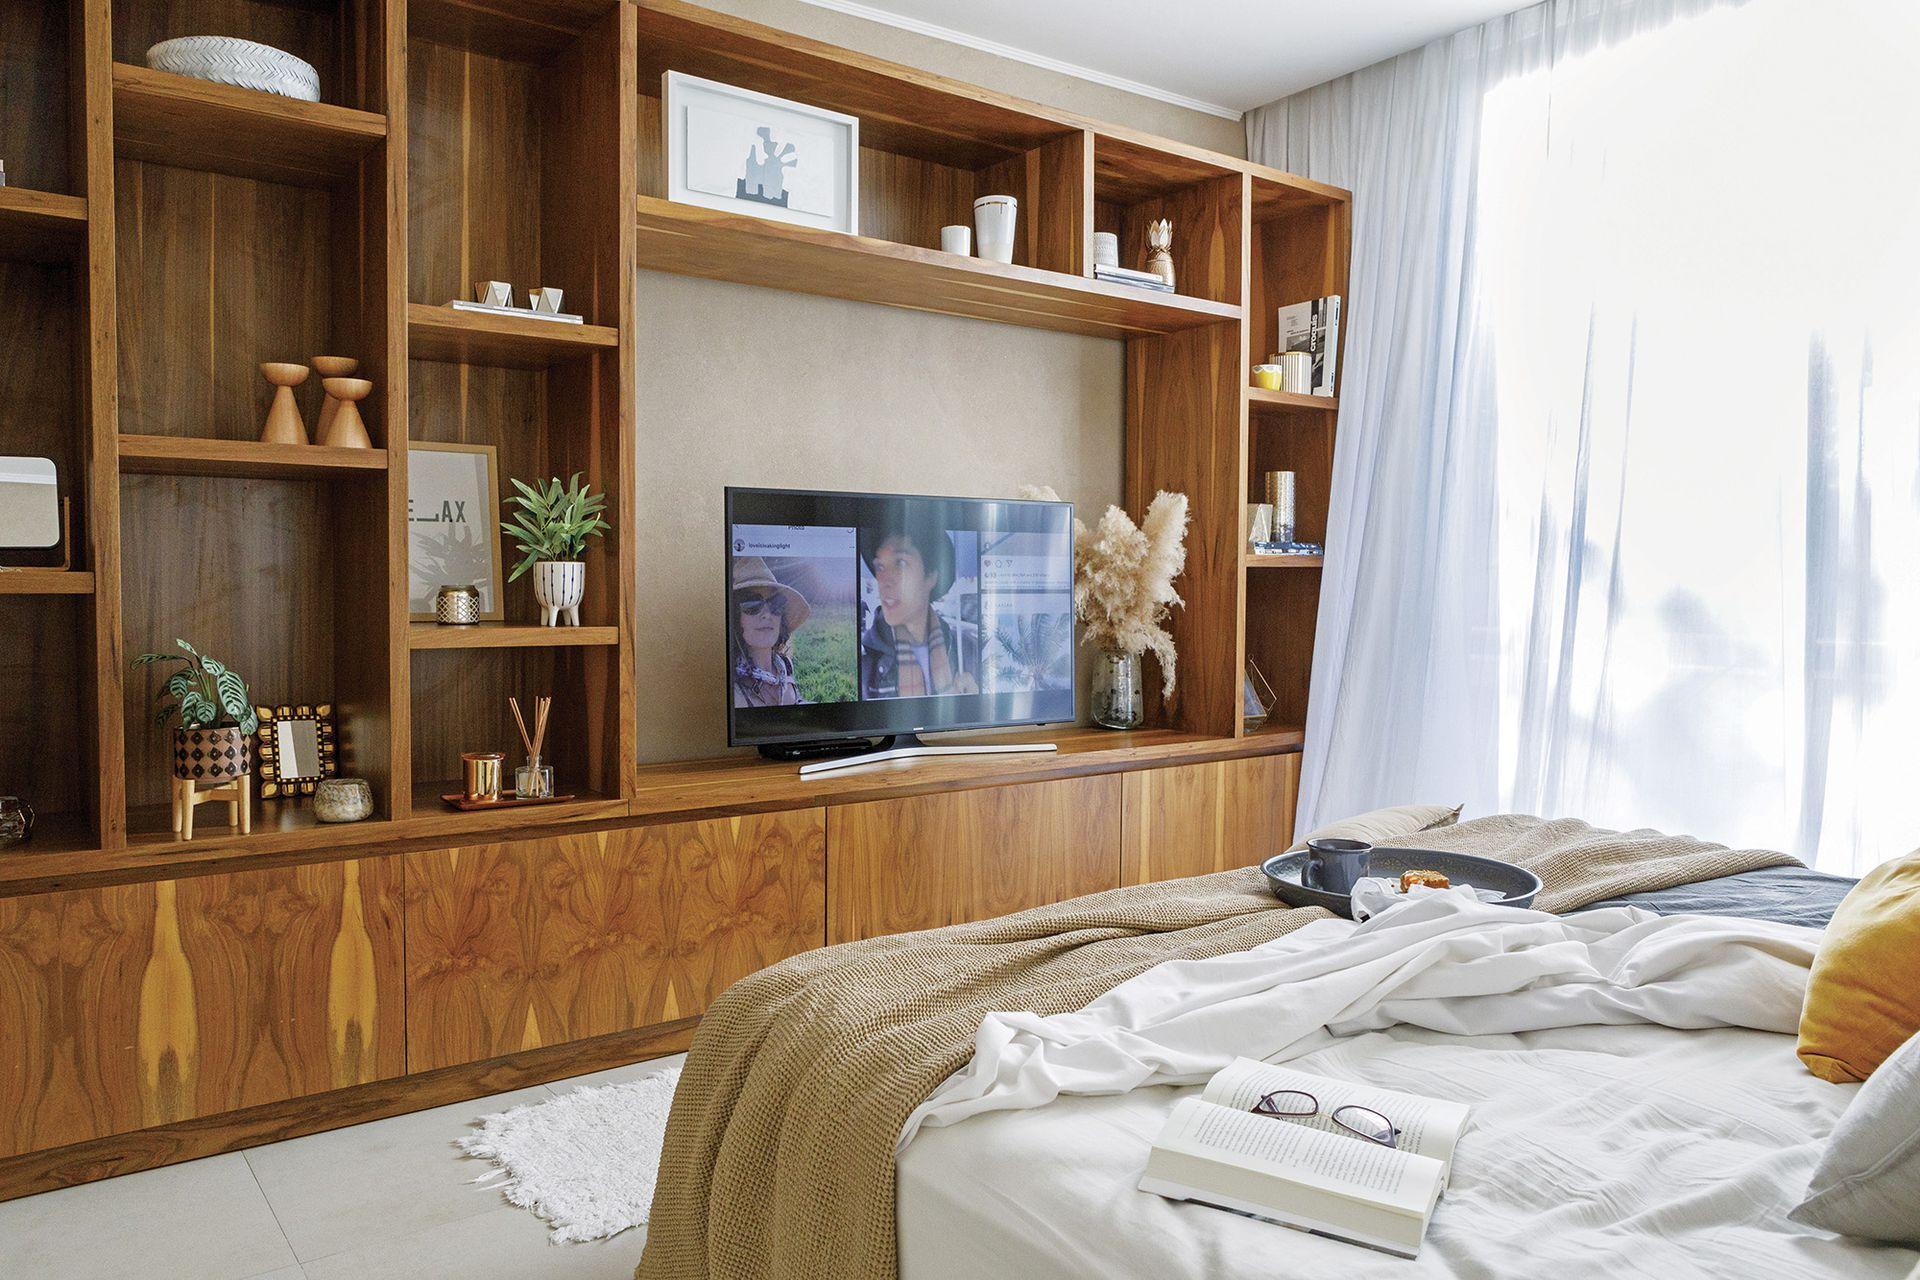 Mueble de petiribí de pared a pared (Estefanía Fasulo). Ropa de cama (todo de Lote Propio). Cortinas de gasa (Romina Guerrero).